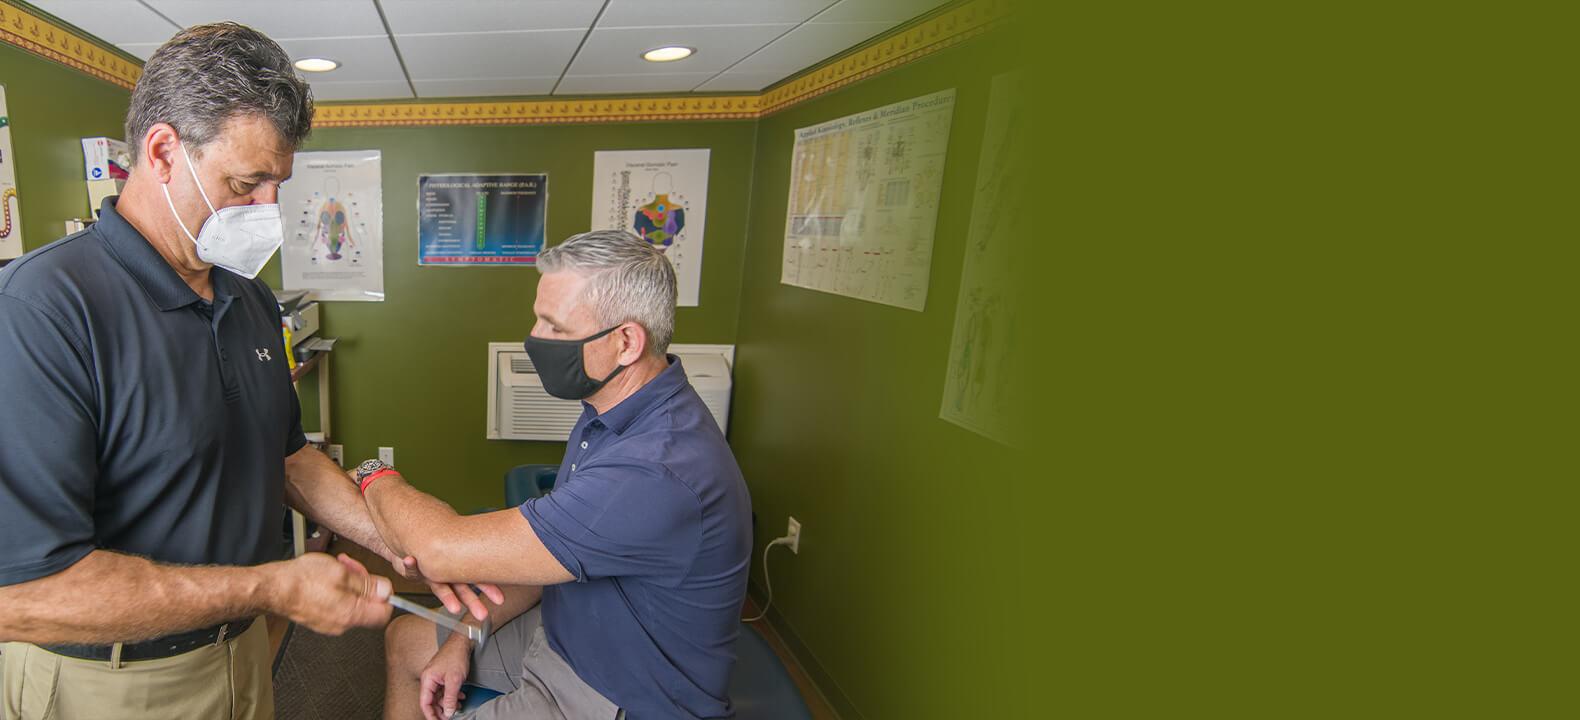 Dr. Mark examining patient